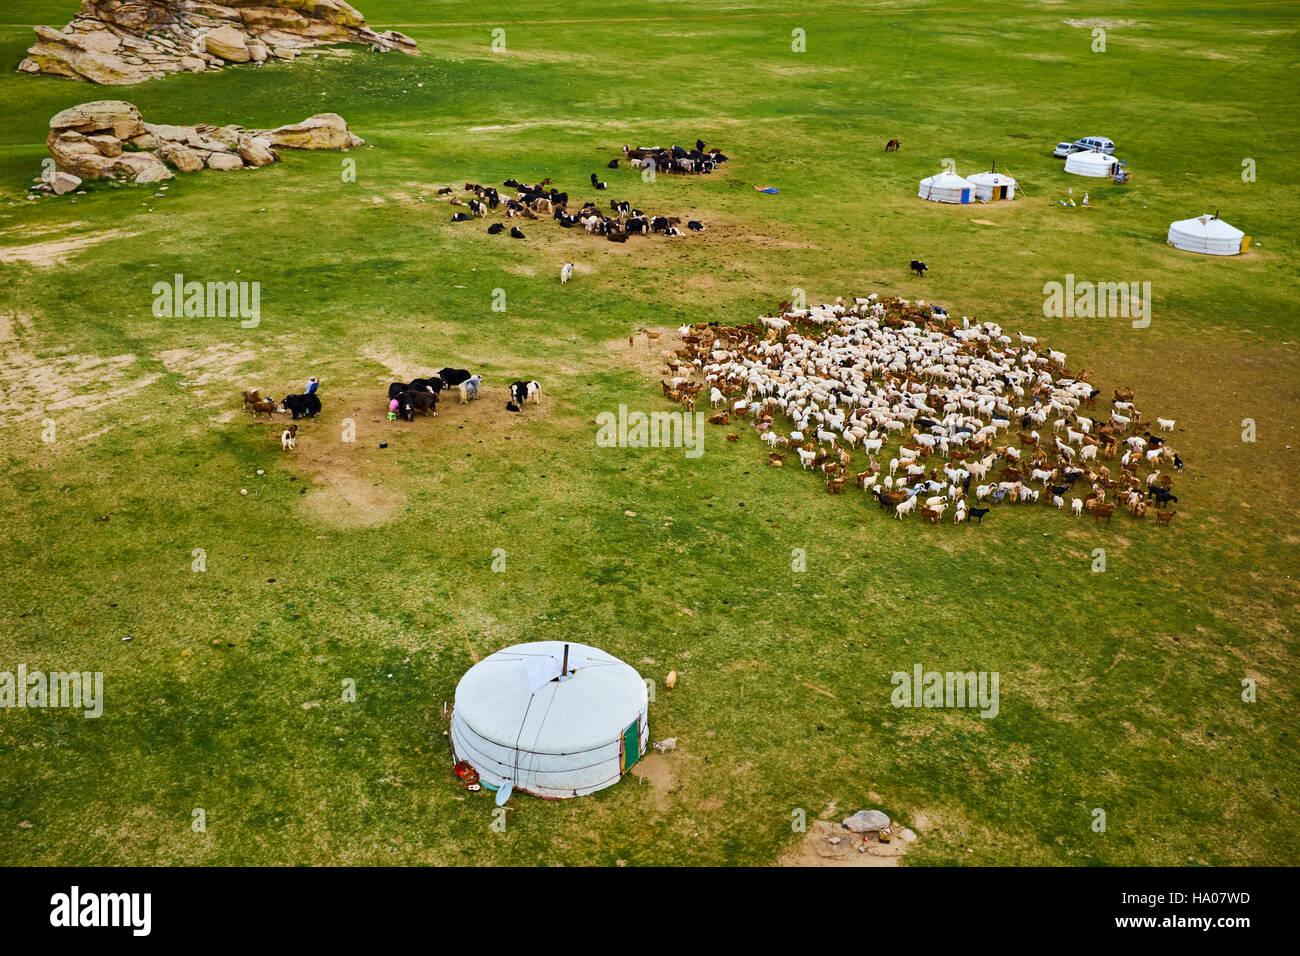 Mongolia, provincia de Bayankhongor, campamento nómada Imagen De Stock